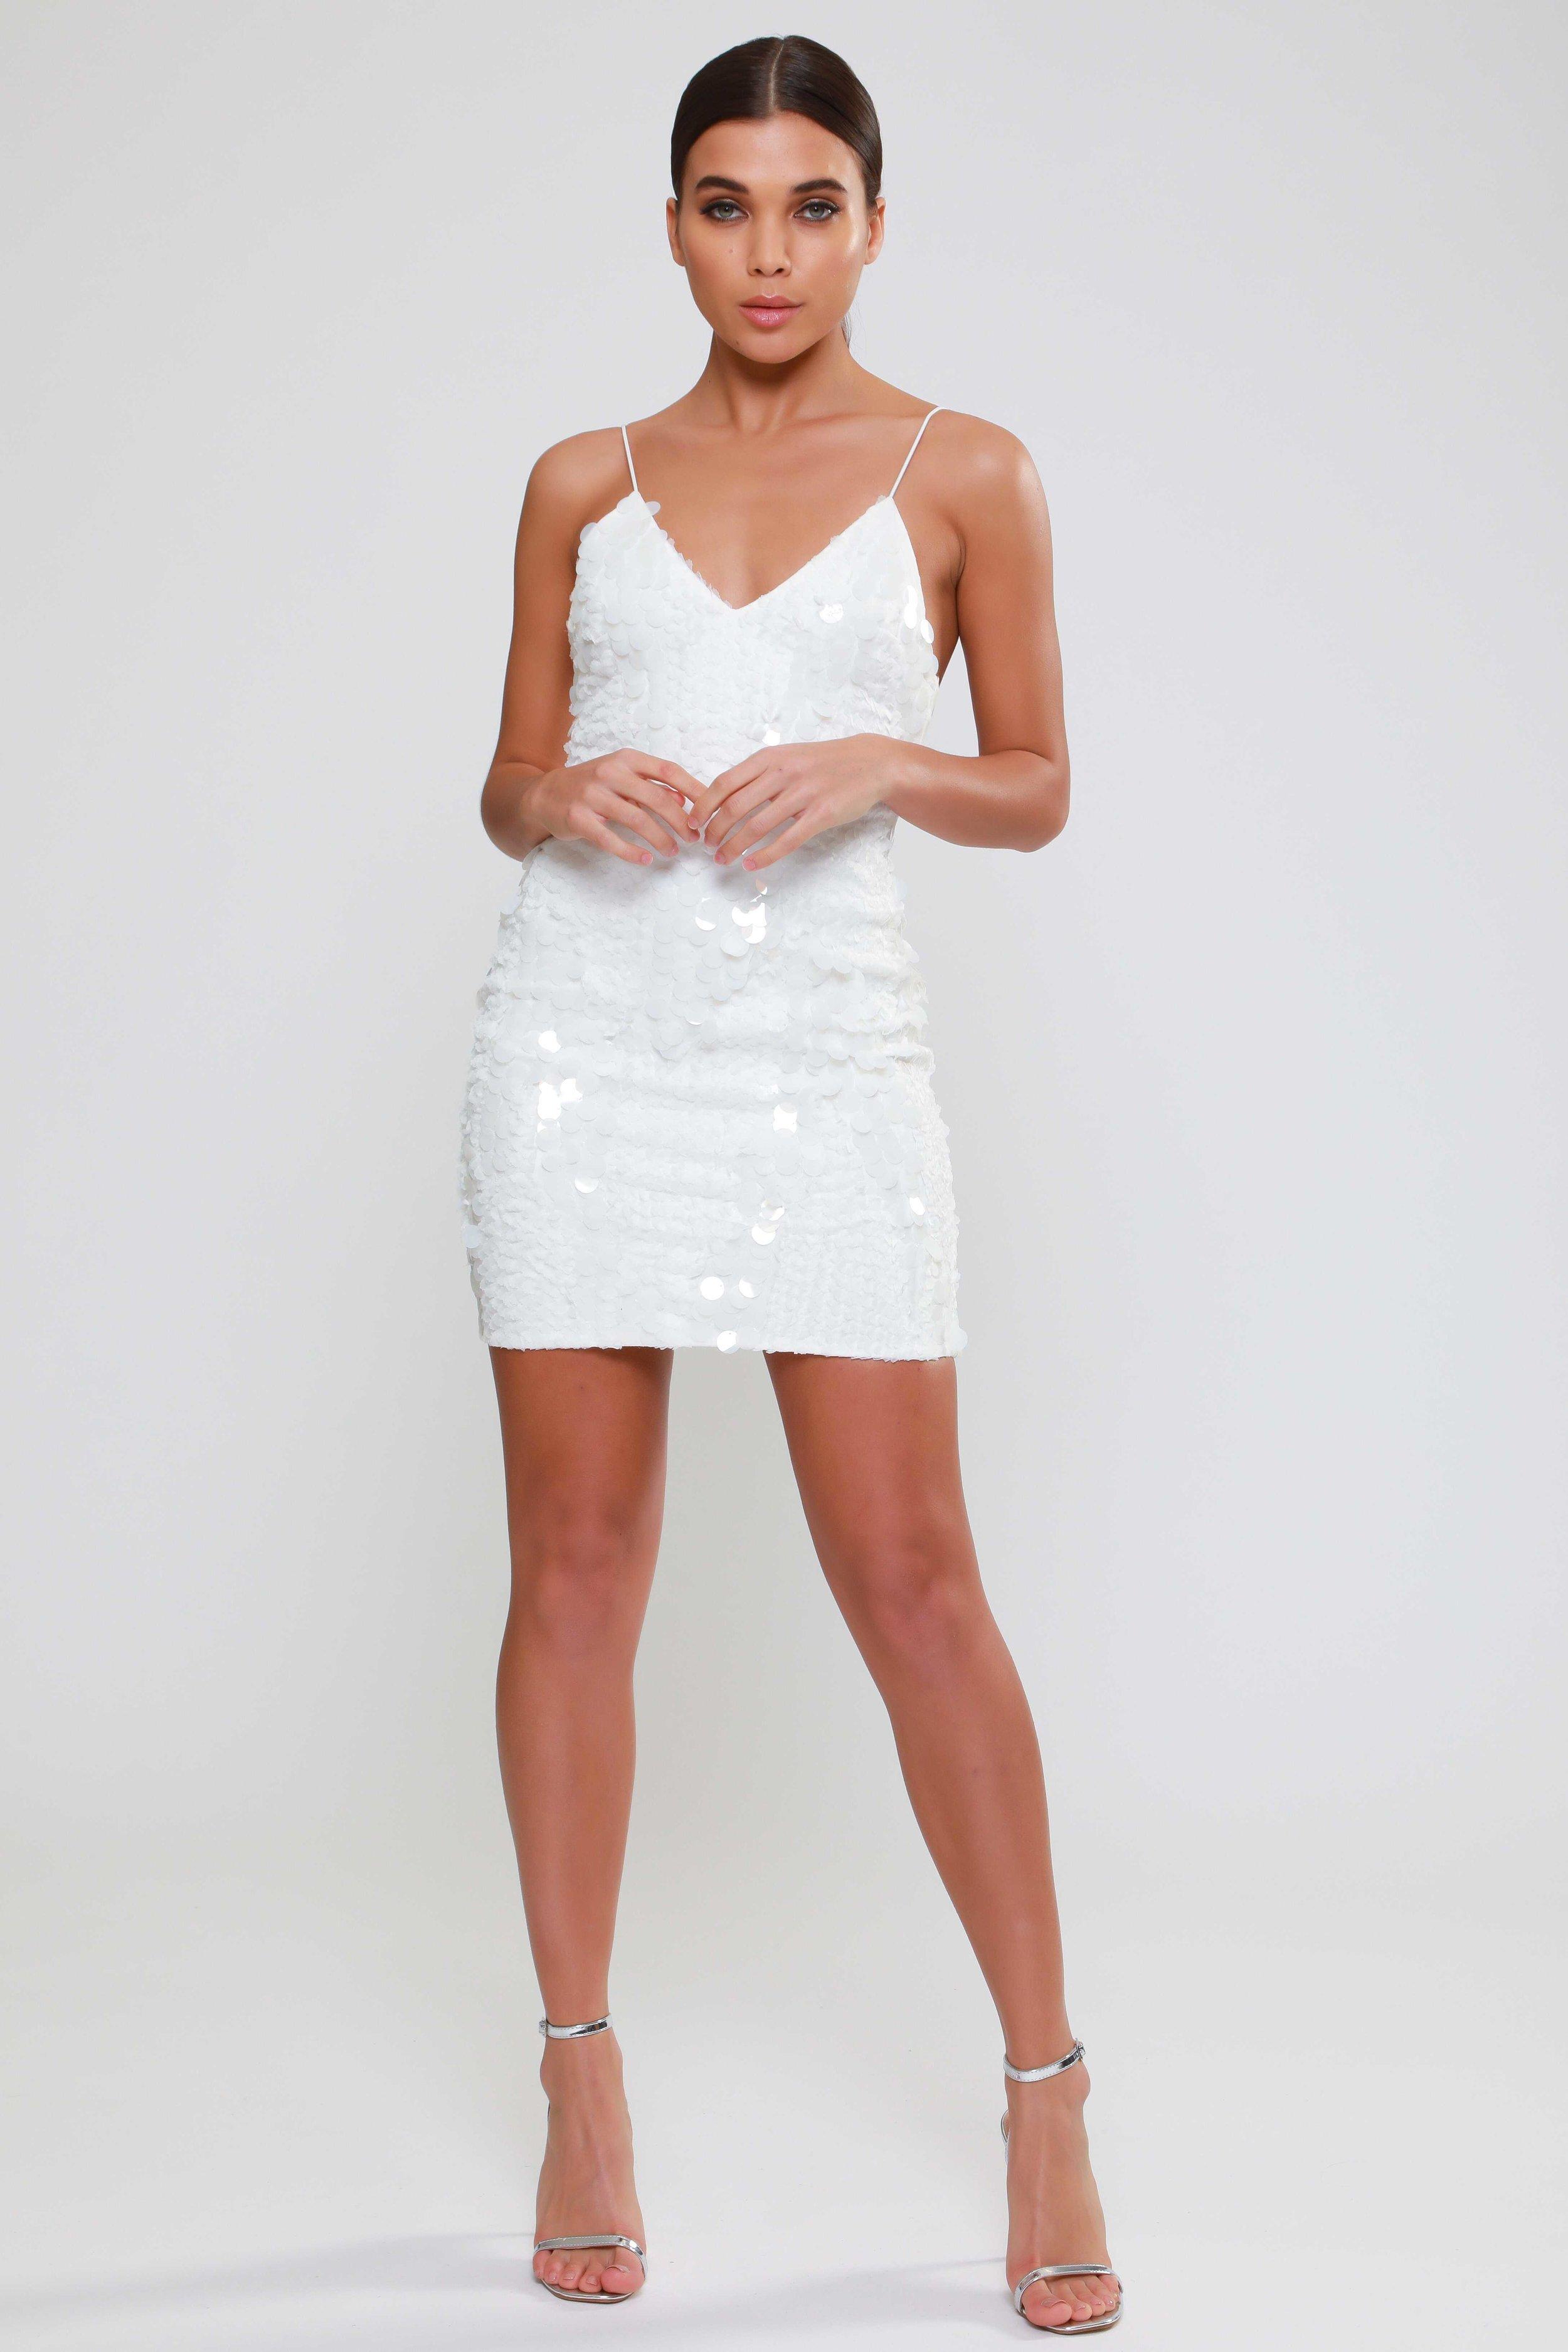 Sequin  Mini Dress   £65.00